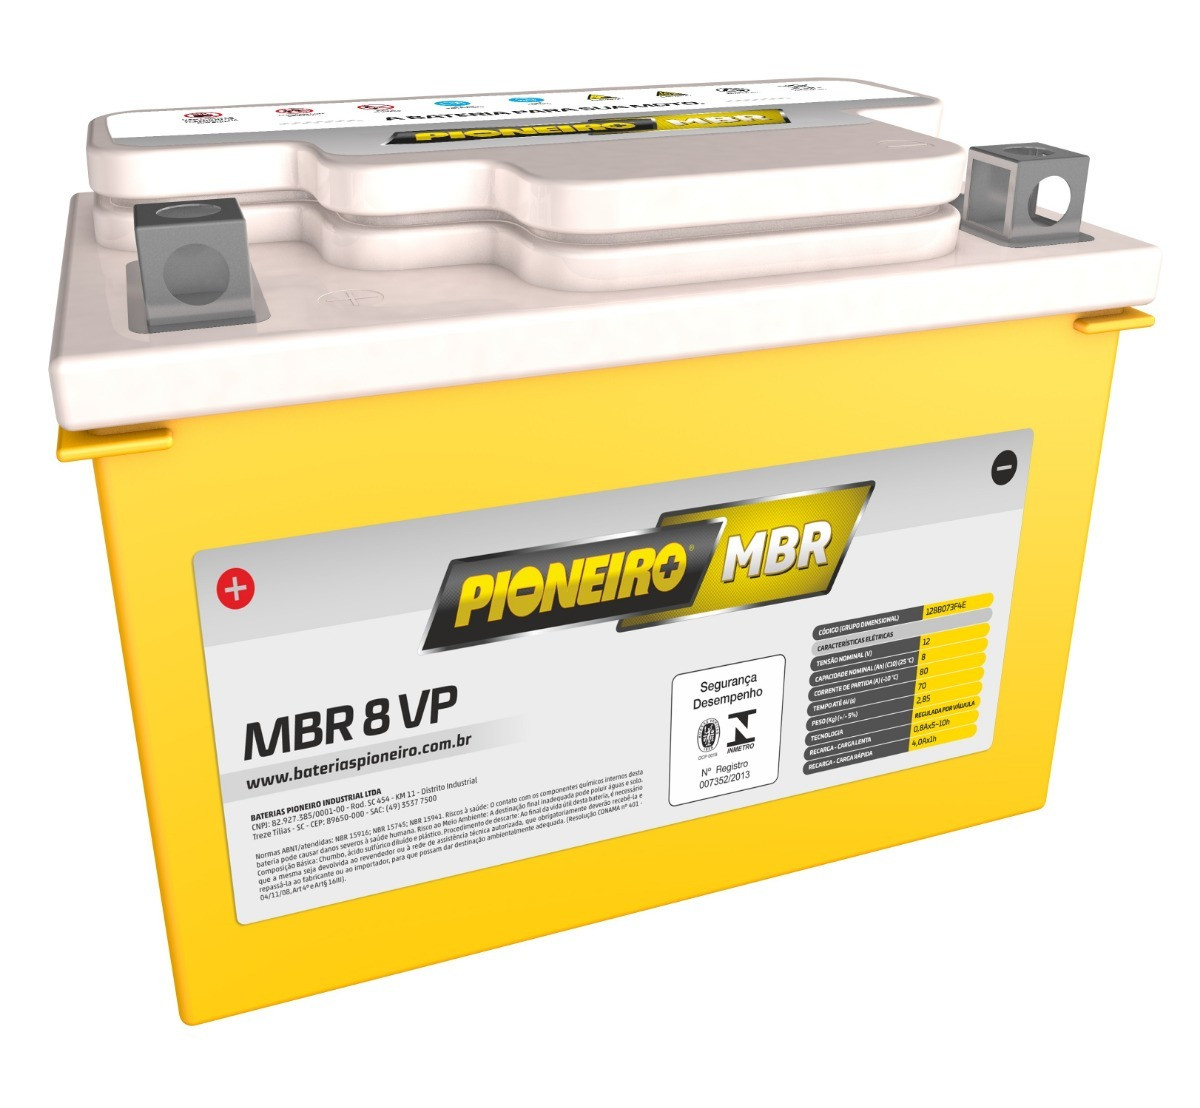 Bateria Pioneiro Mbr8-Vp 12v/8ah Cb500 CBR600 87/00 CBR 900r/Rr 93/99 Hornet 600 08/10 NC 700 NX 650 Shadow 60 0 Burgman 400 Xt600 93/05 Gsx-R 600